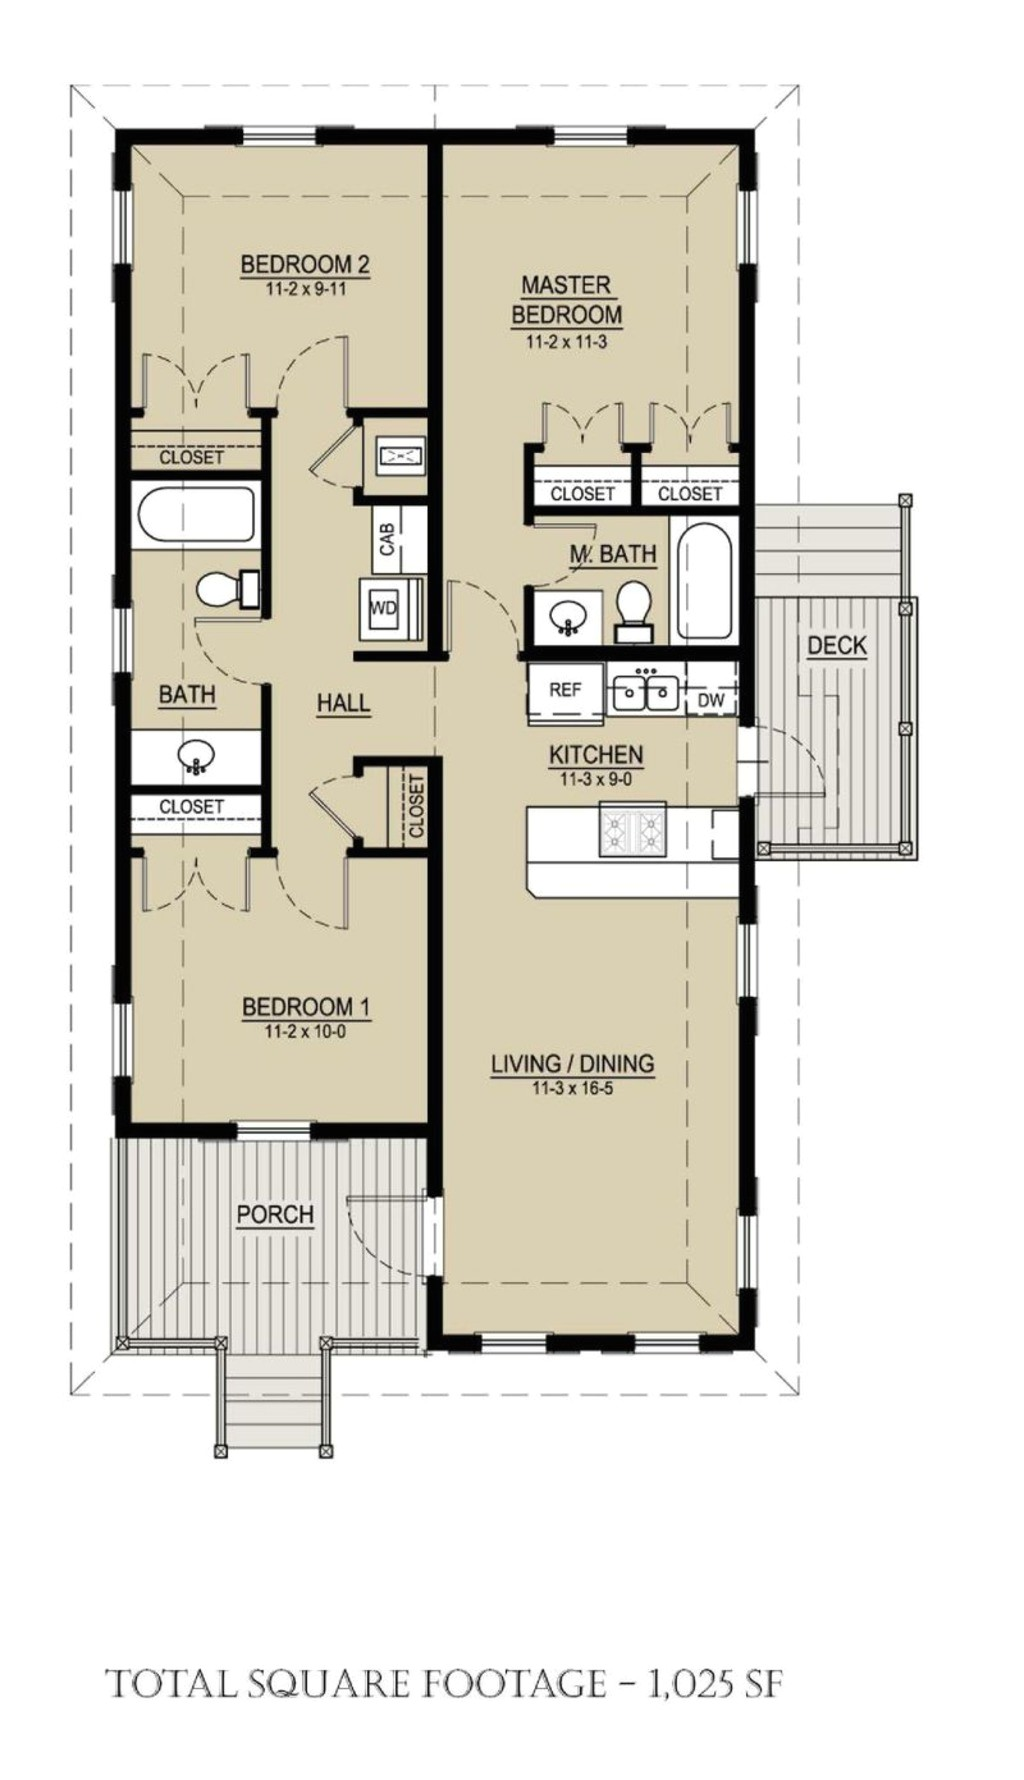 1025 square feet 3 bedrooms 2 bathroom cottage house plans 0 garage 36983